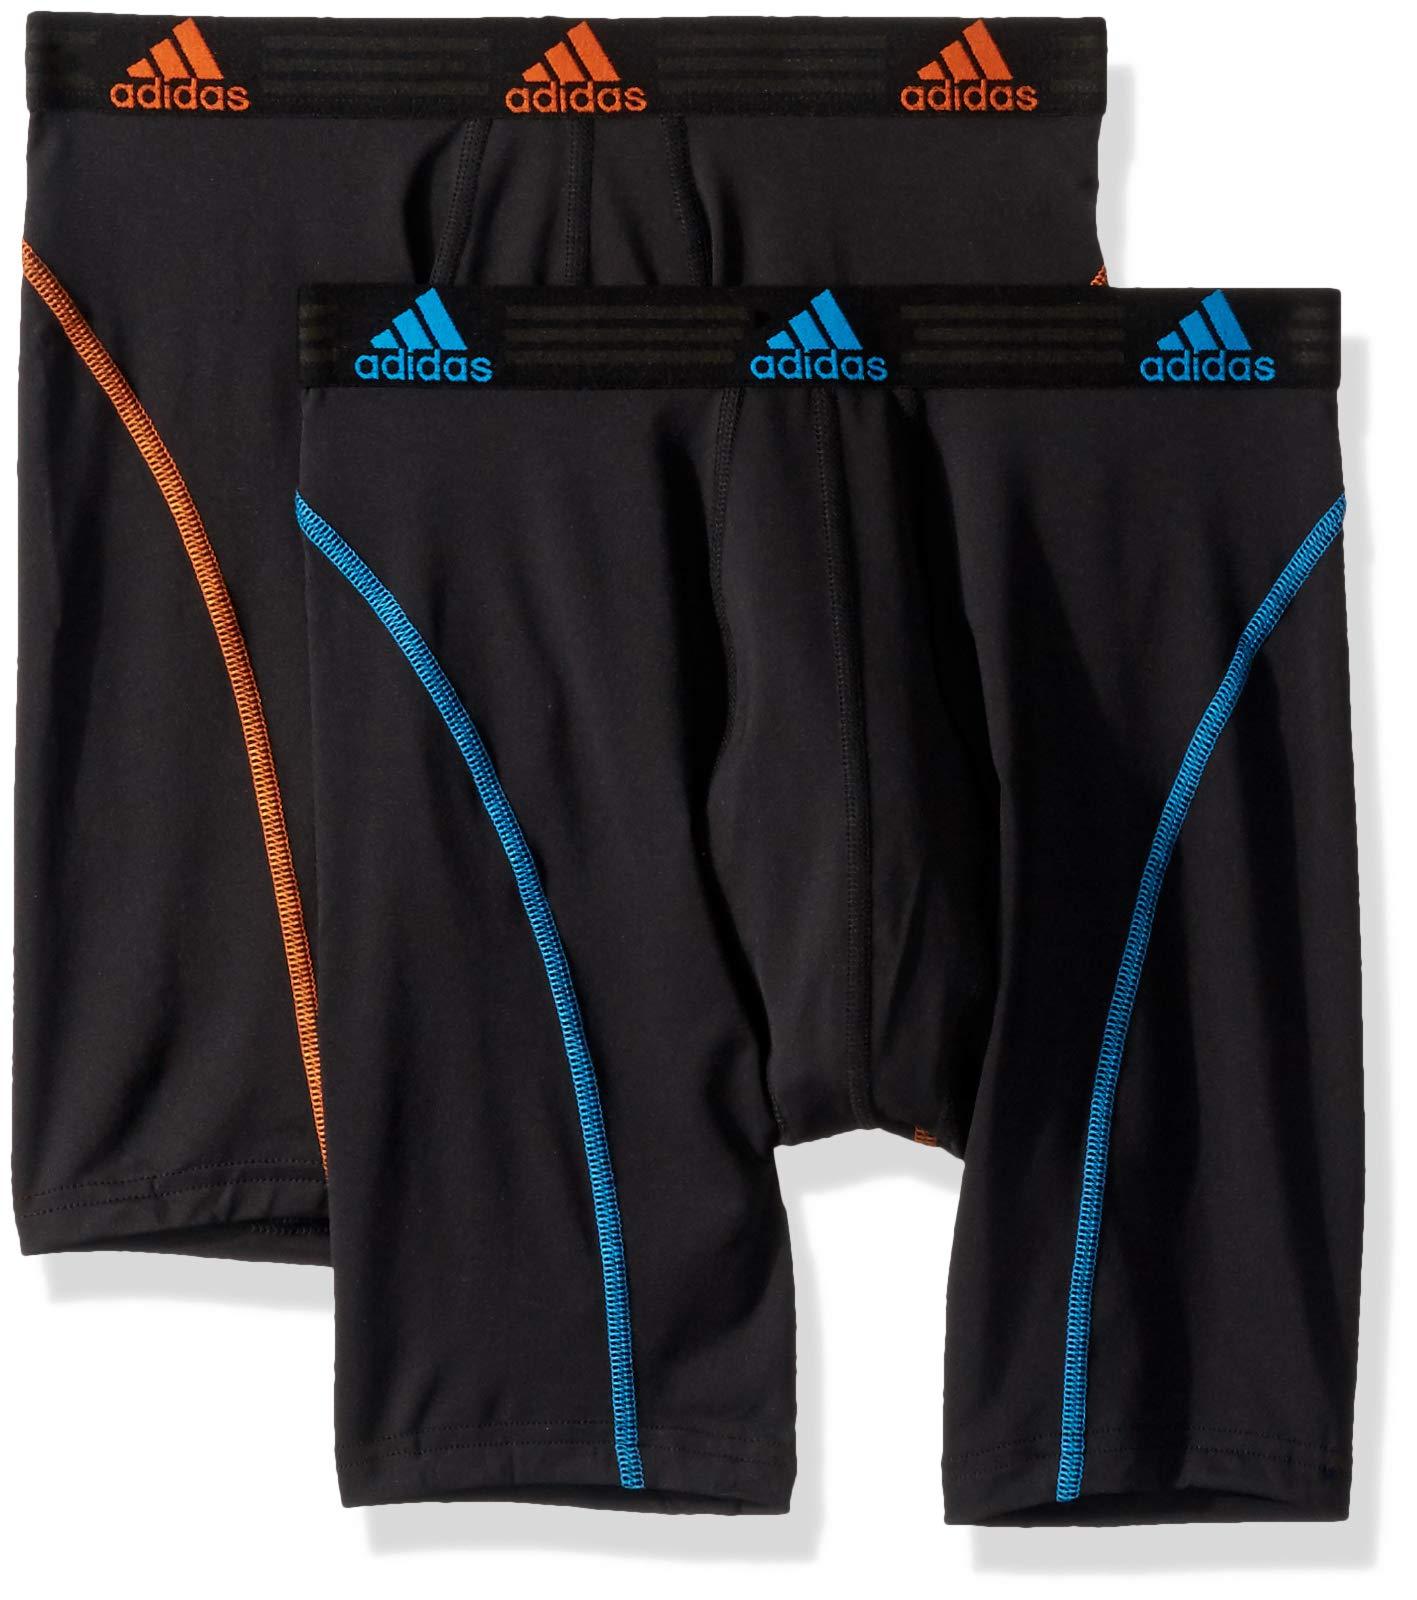 adidas Men's Sport Performance Midway Underwear (2-Pack), Black/Bright Blue Black/Orange, SMALL by adidas